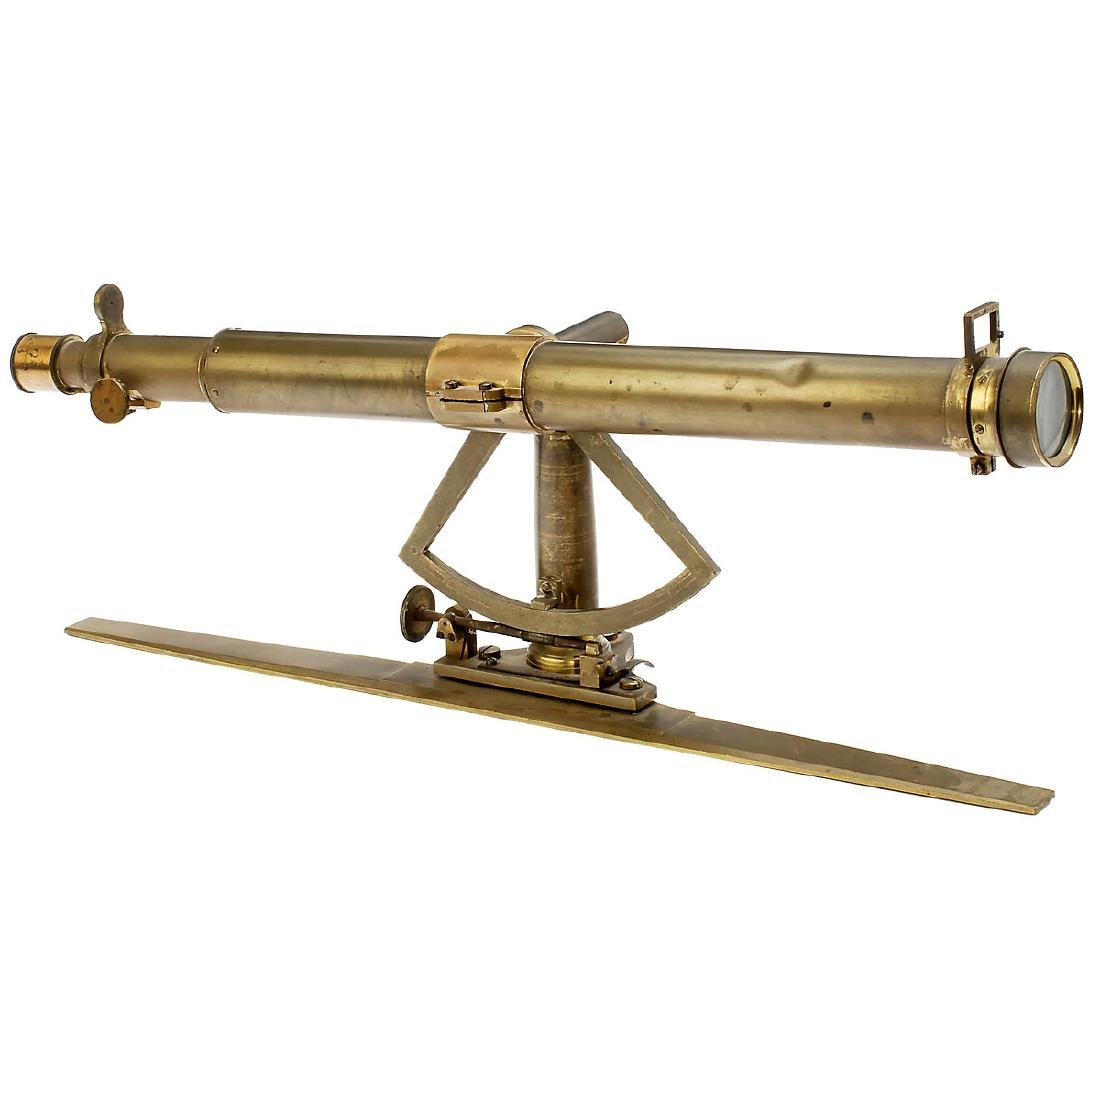 Reichenbach's Optical Distance Meter, c. 1820